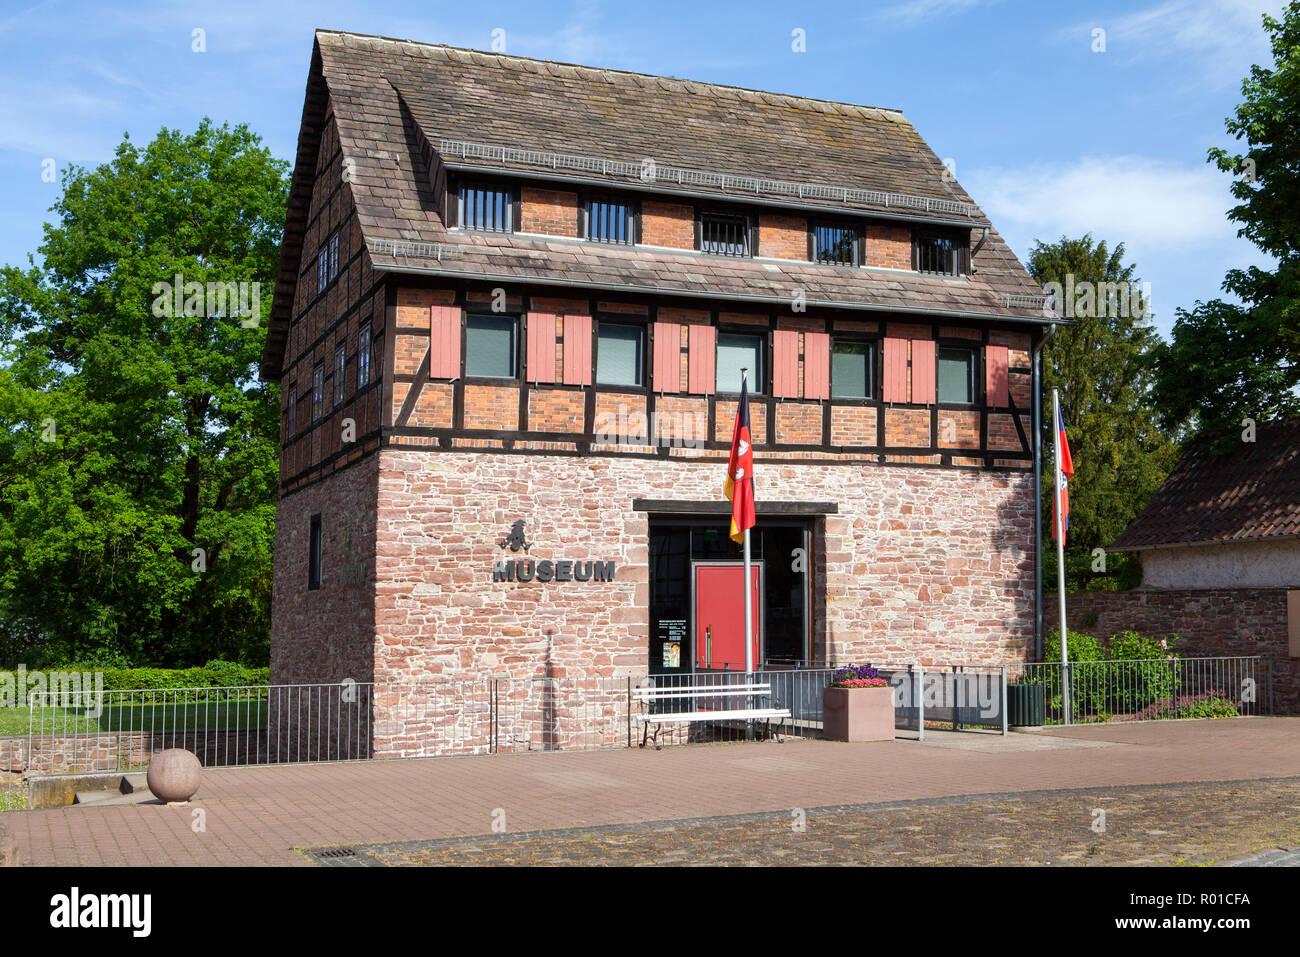 Baron Muenchhausen museum, Bodenwerder, Weserbergland, Baja Sajonia, Alemania, Europa Foto de stock